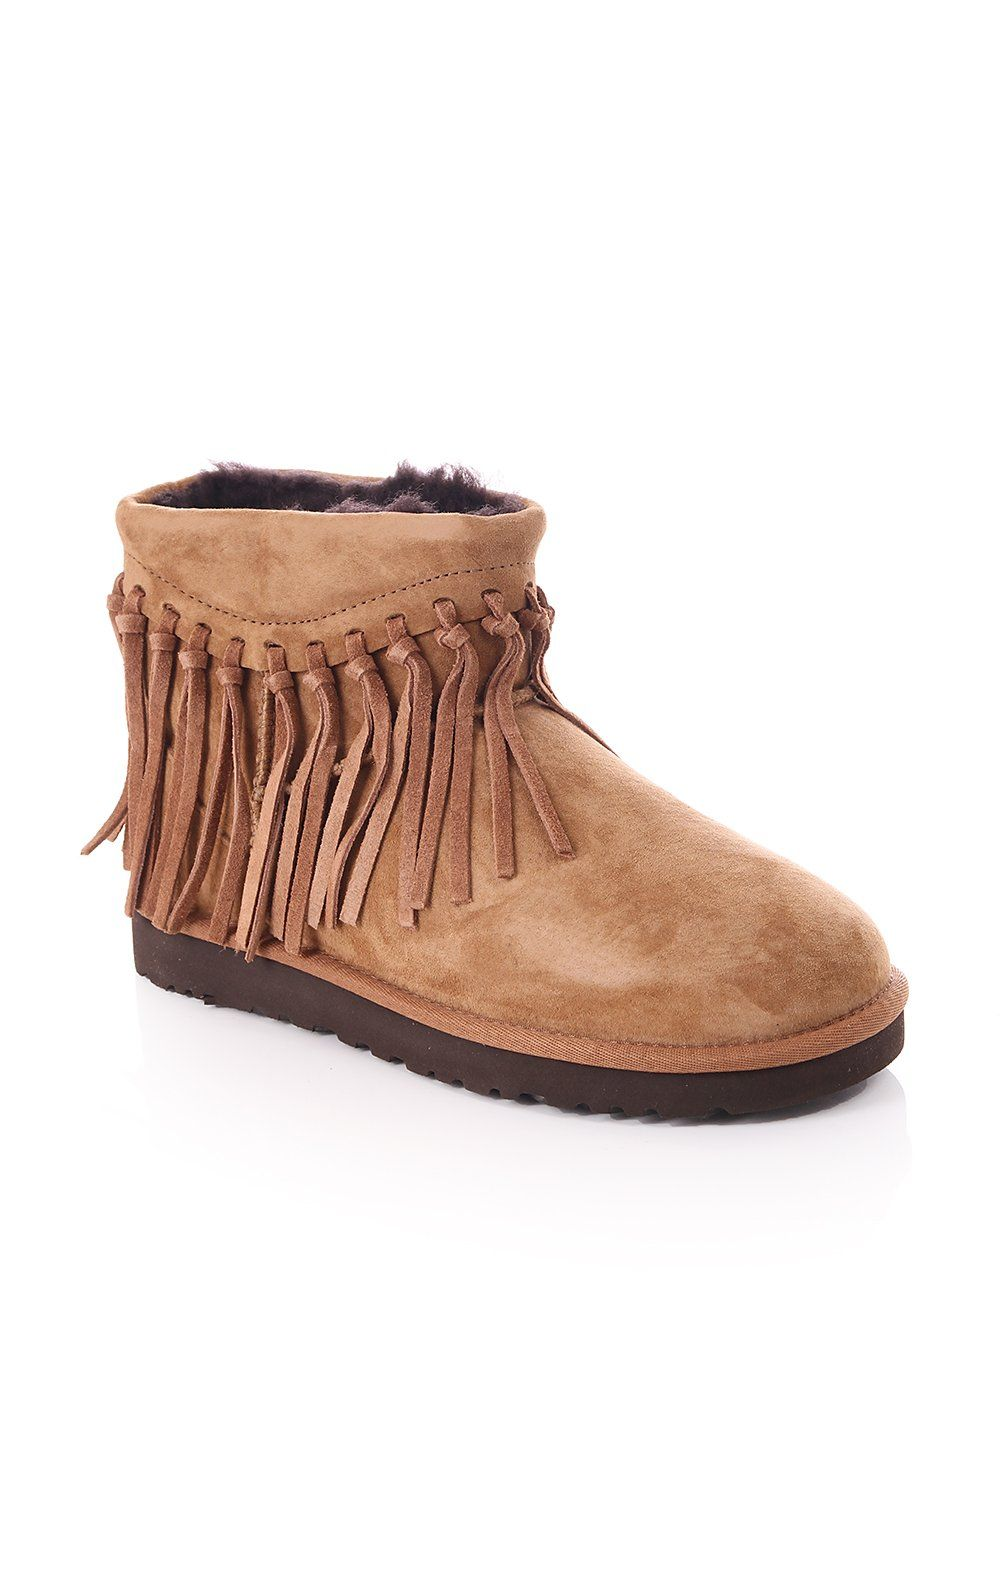 6a57375123c Ugg Australia Wynona Frindge Suede Ankle Boot Chestnut | UGG AW15 ...